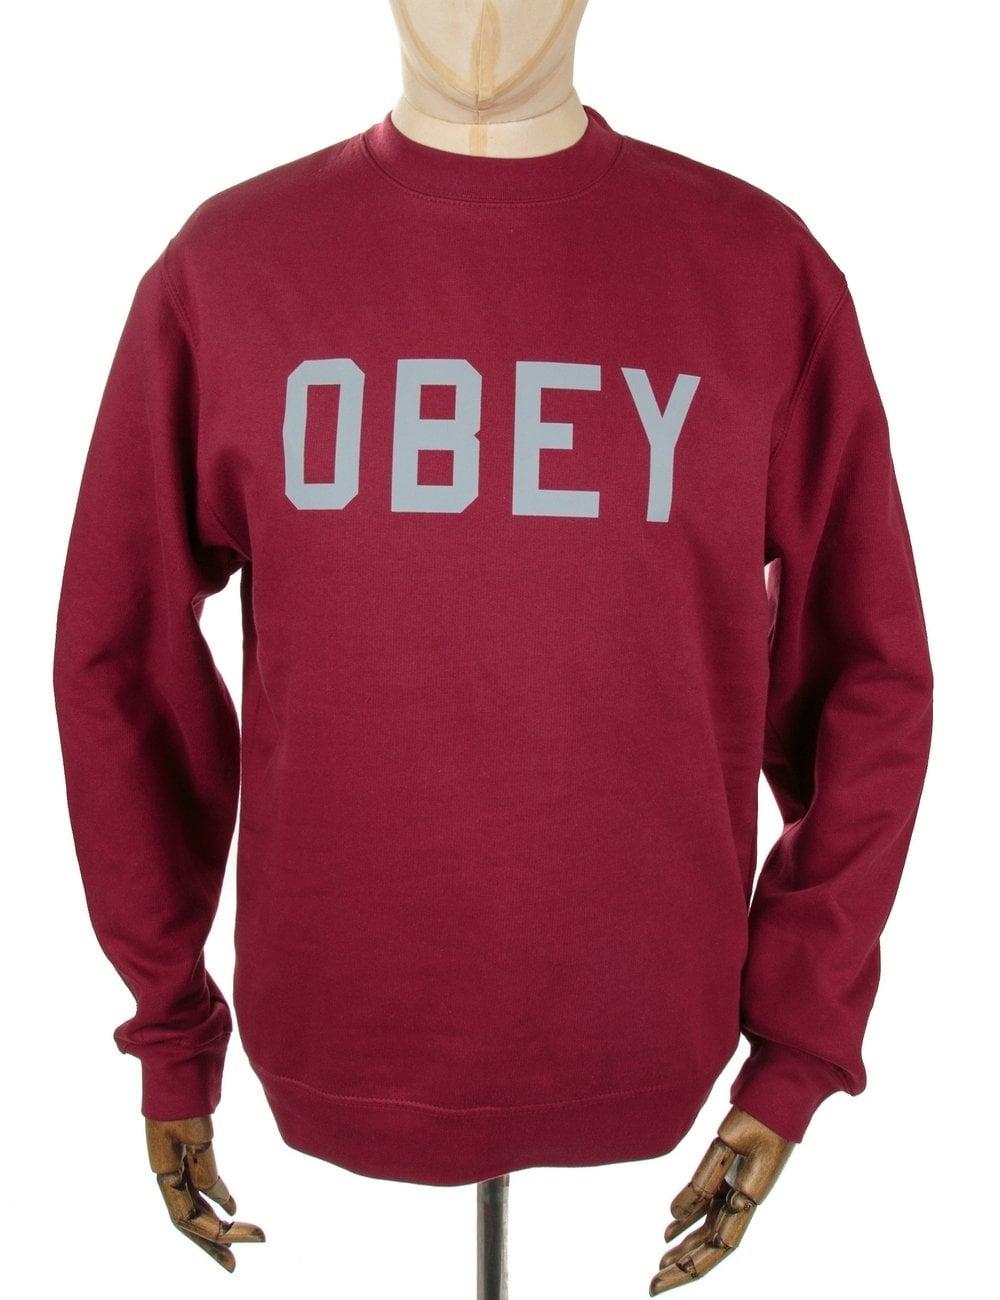 Obey Clothing 3M Collegiate Crewneck Sweatshirt - Cardinal ...